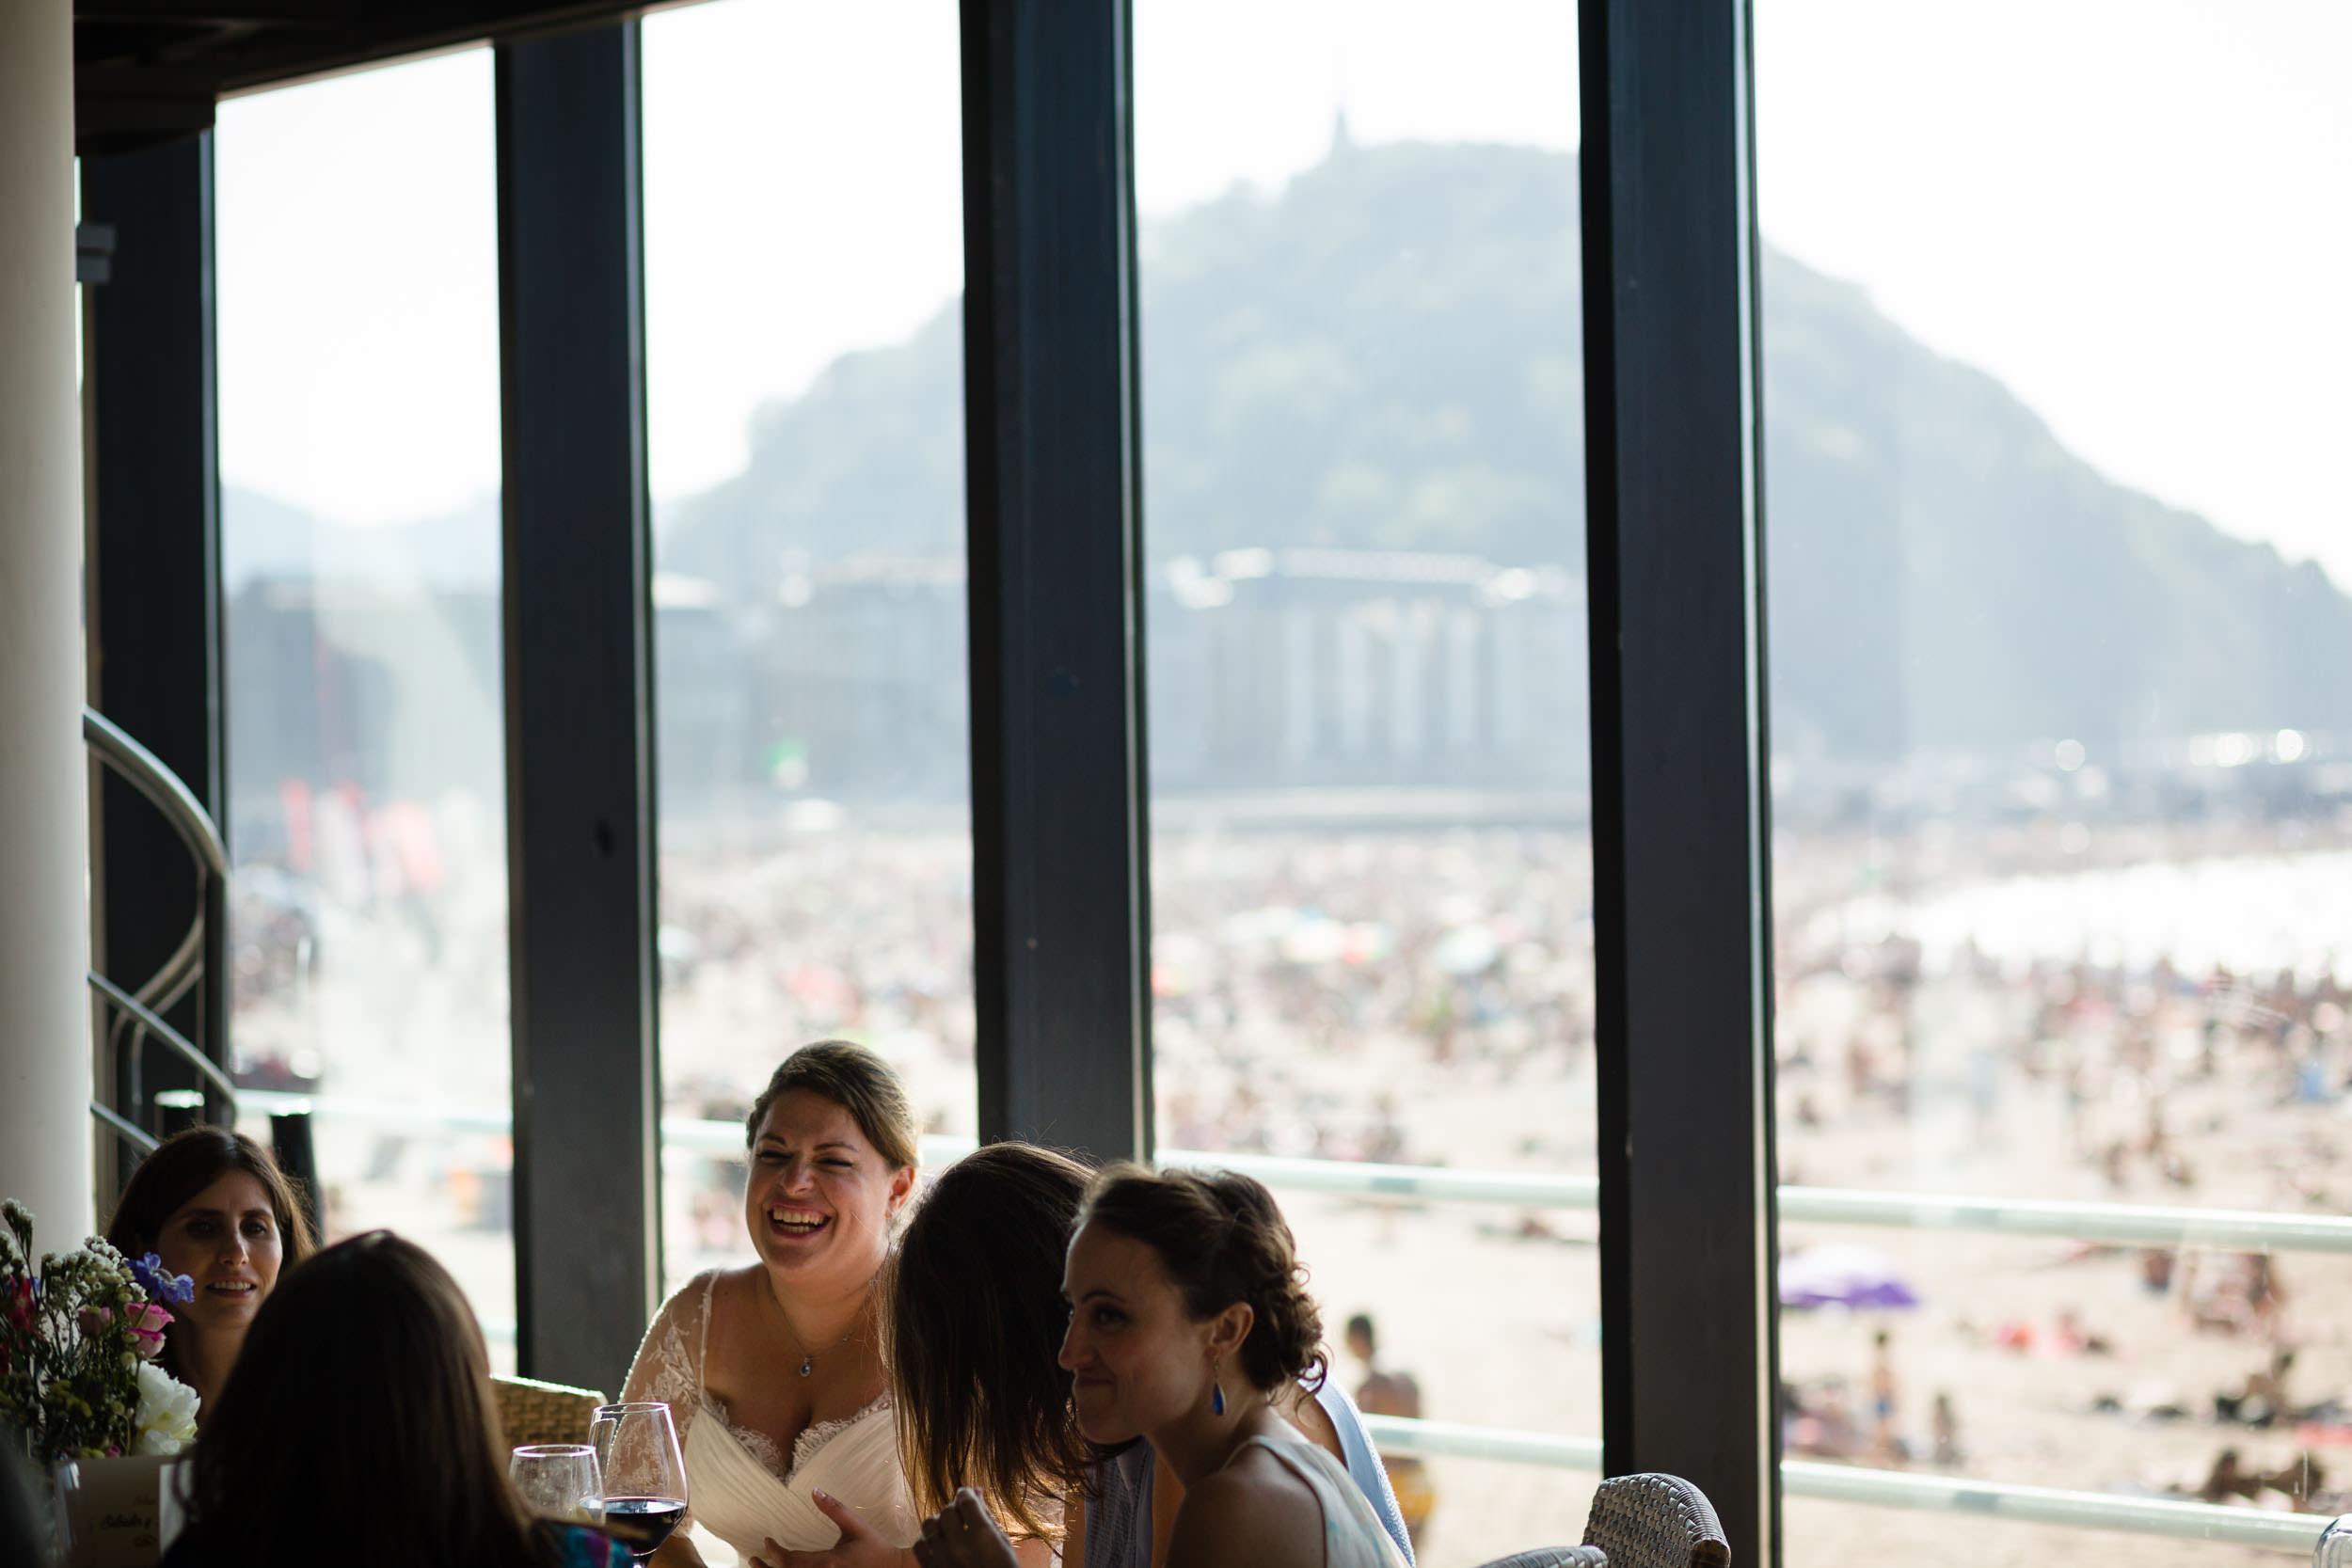 San Sebastian Wedding Photography - James Sturcke | sturcke.org